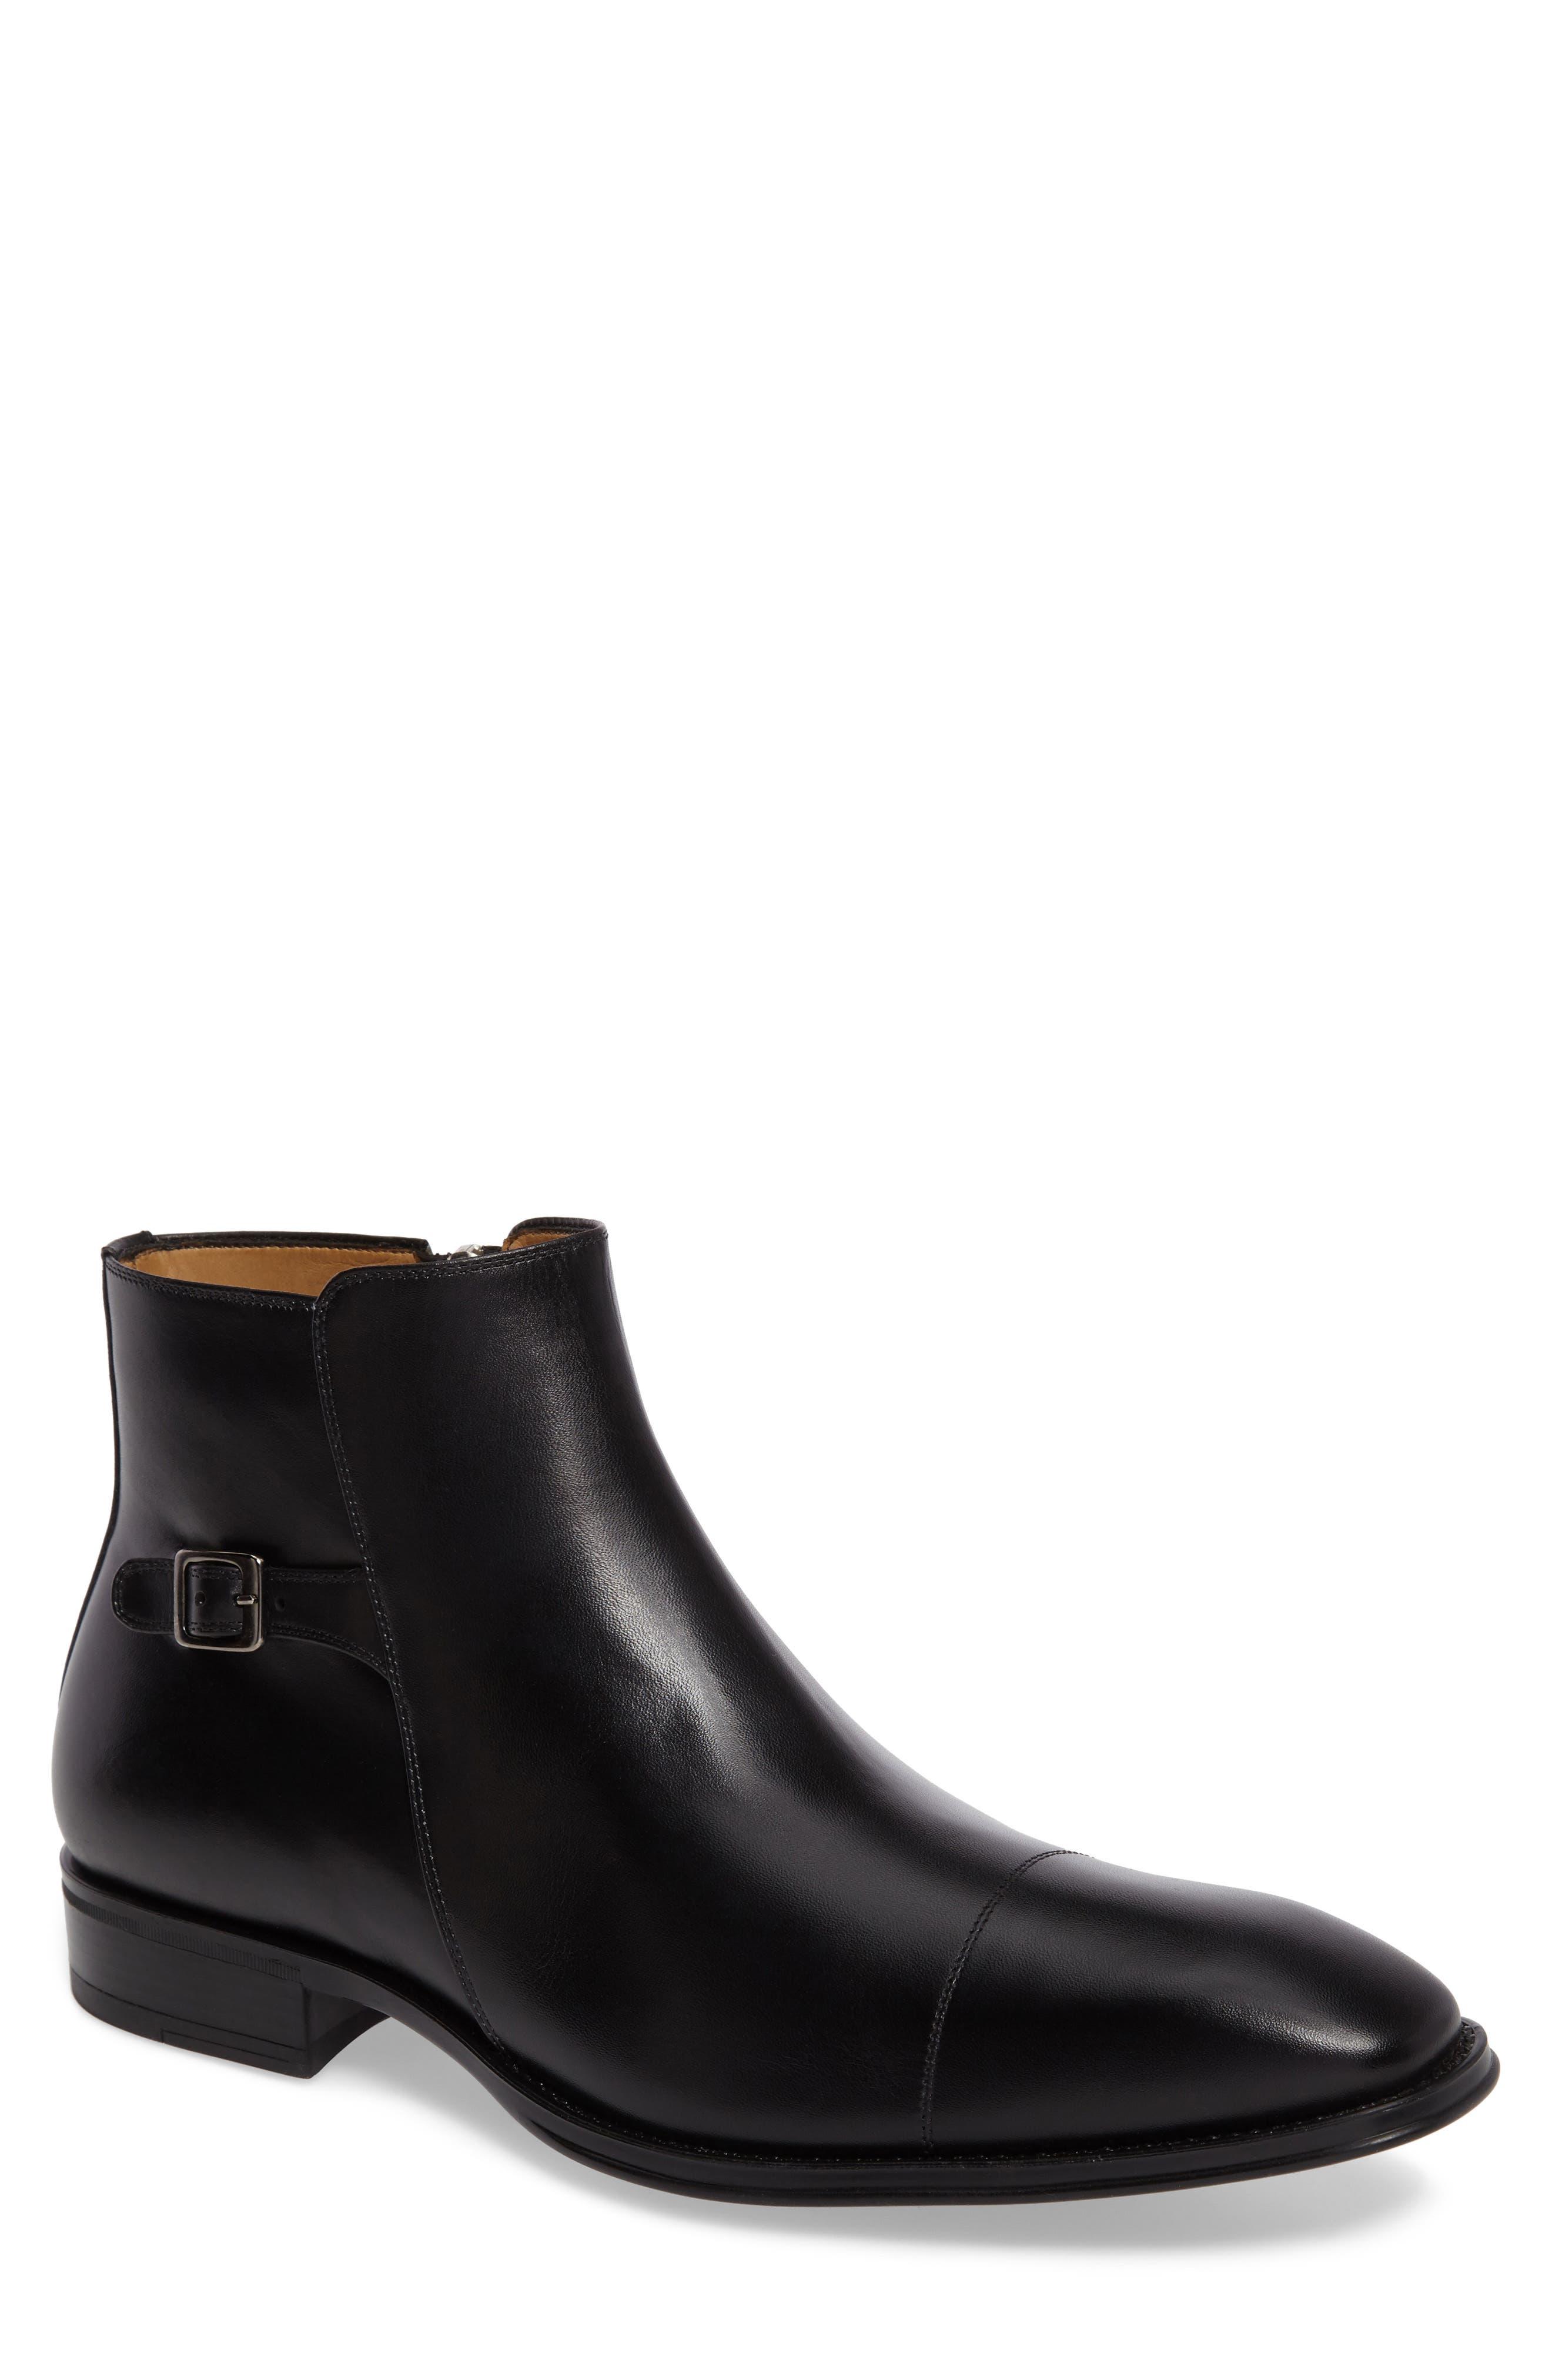 Casares II Zip Boot,                         Main,                         color, Black